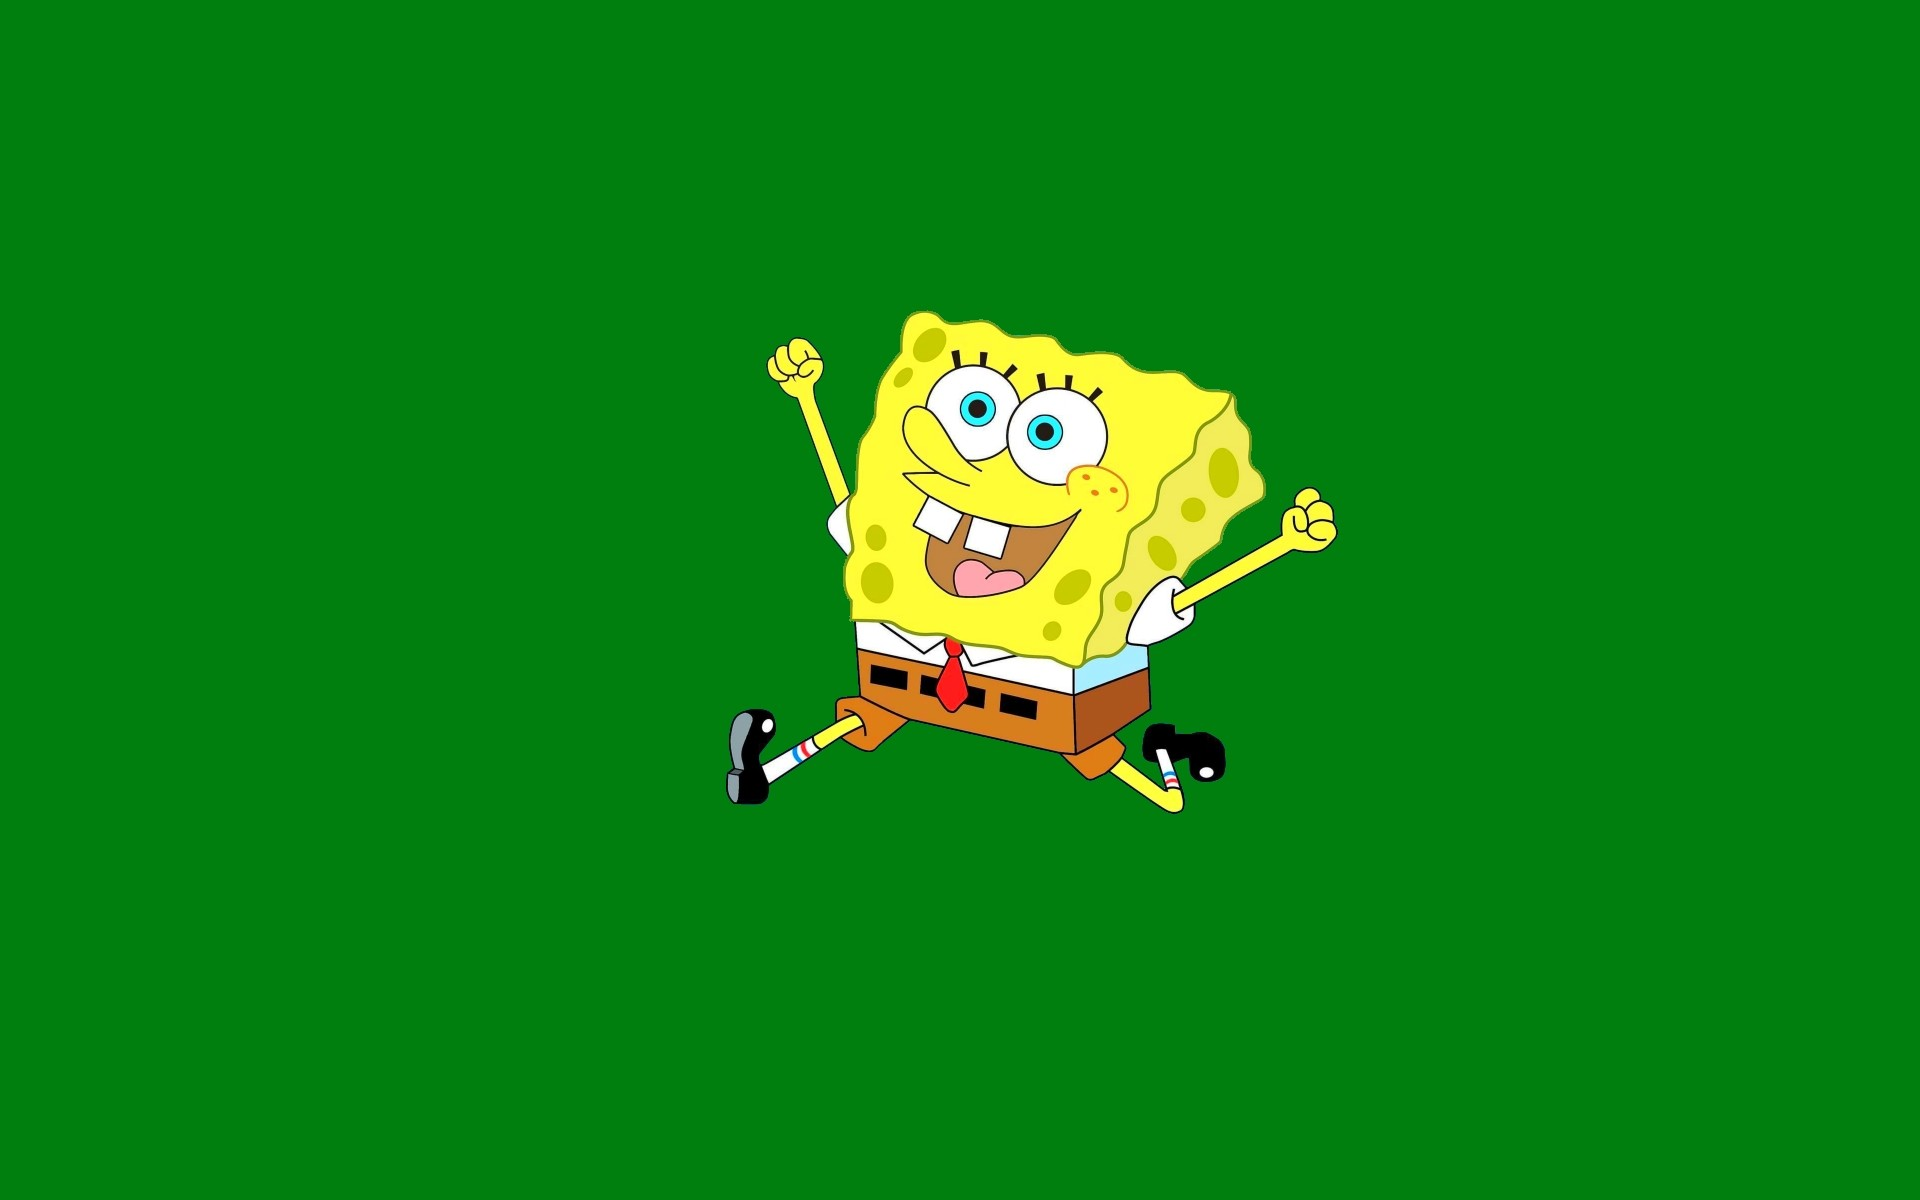 Simple SpongeBob HD background: